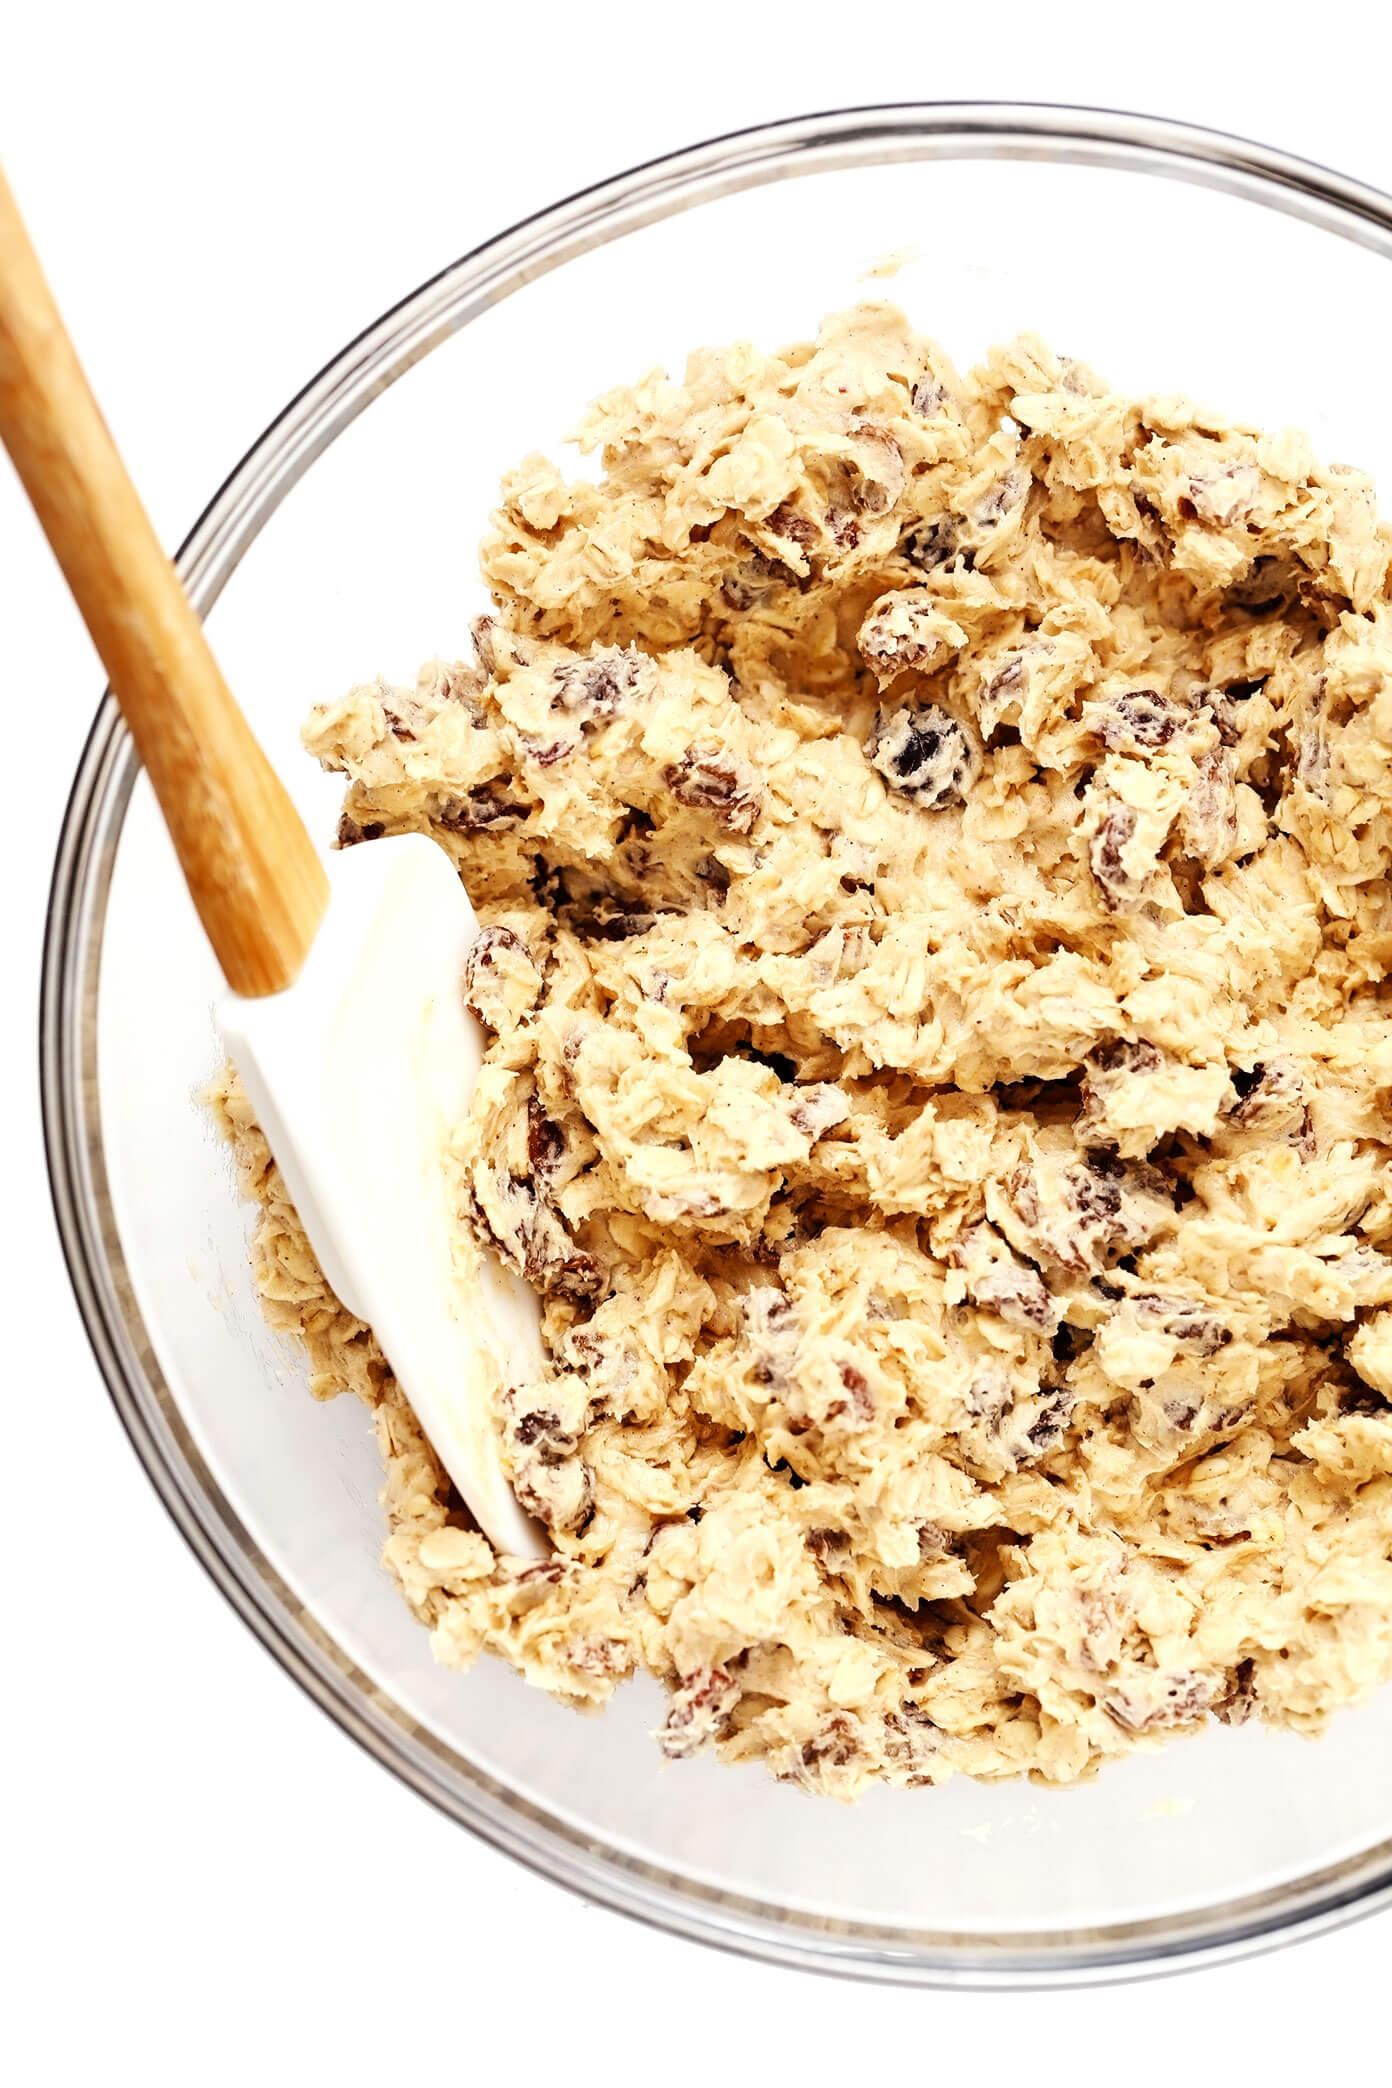 Oatmeal Cookie Dough with Raisins